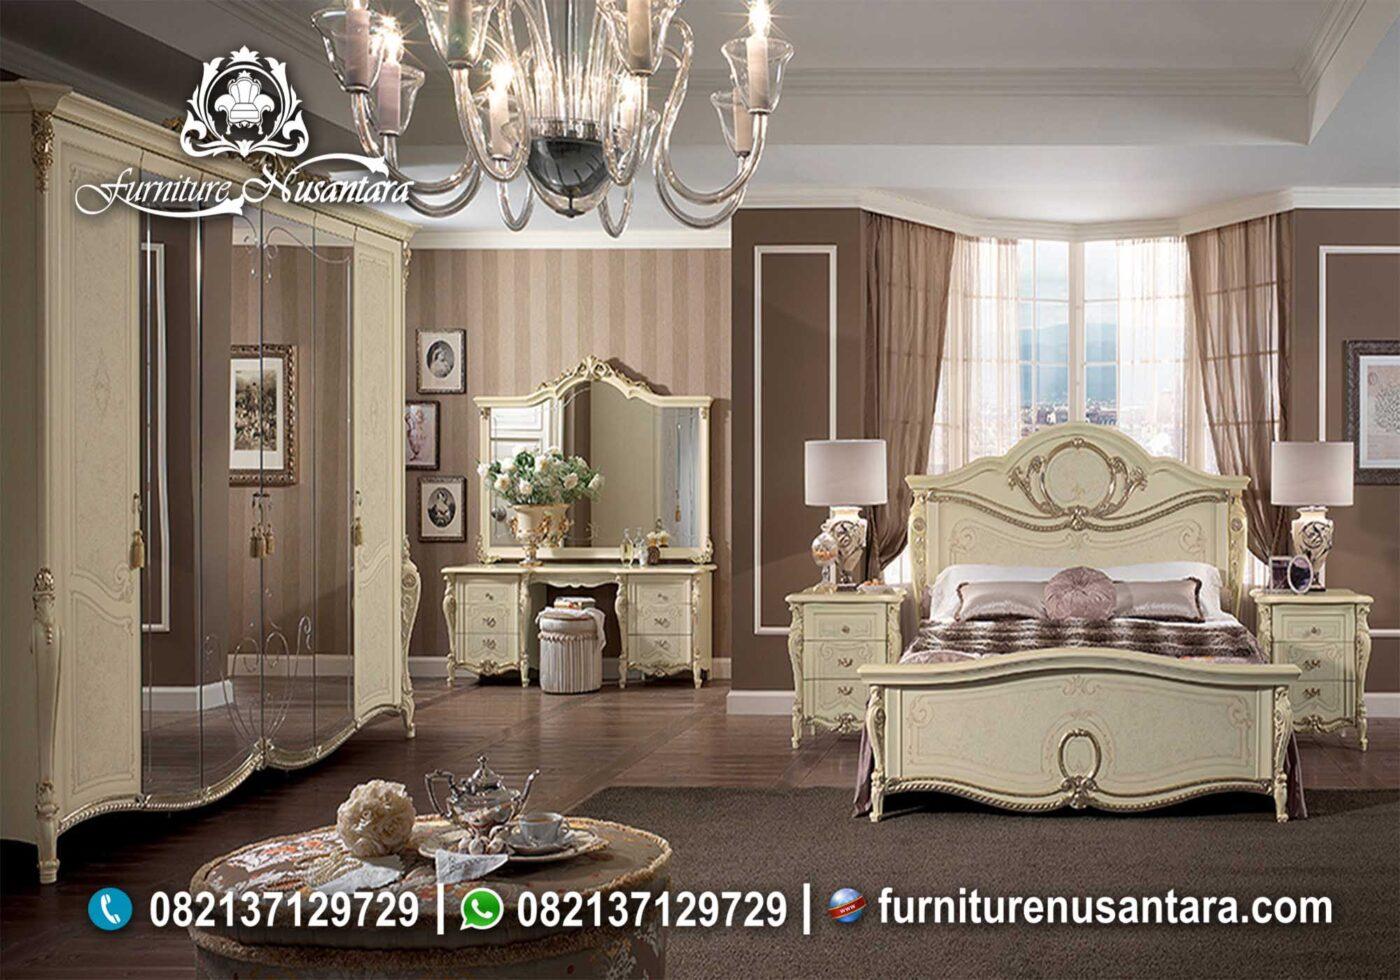 Harga Tempat Tidur Terbaru 2021 KS-90, Furniture Nusantara